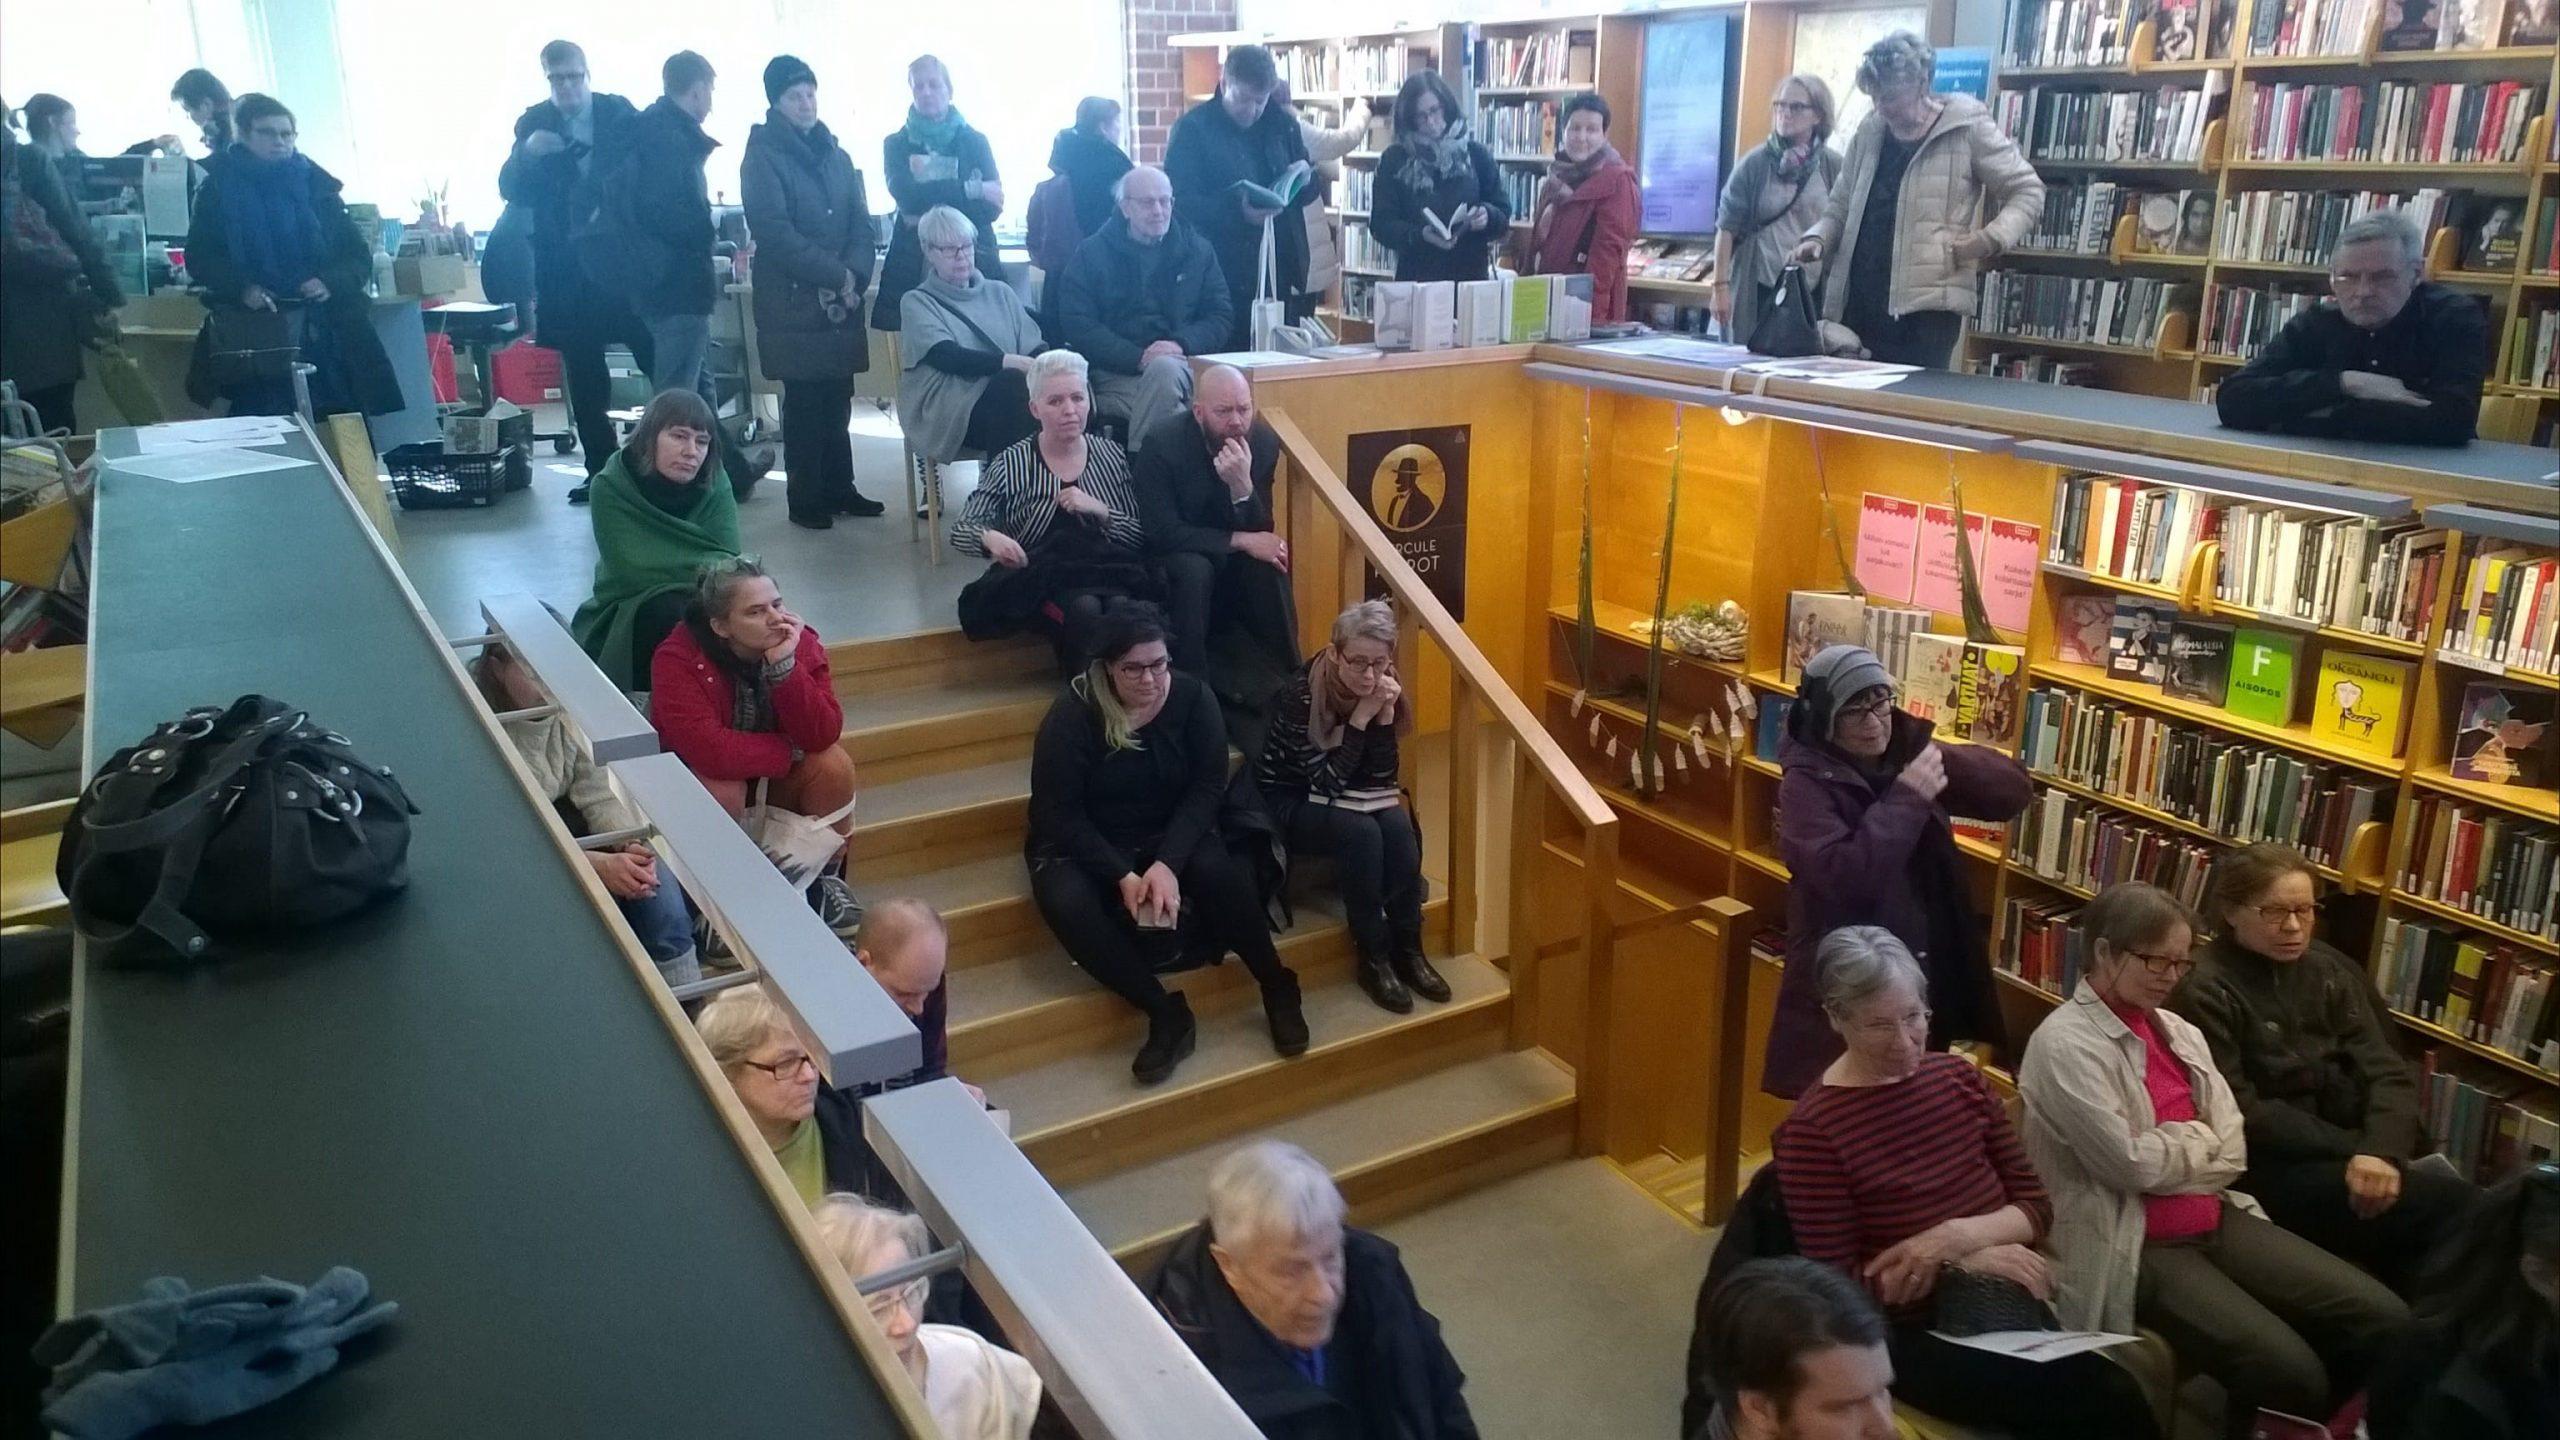 kirjasto 1 20180317 WA0010